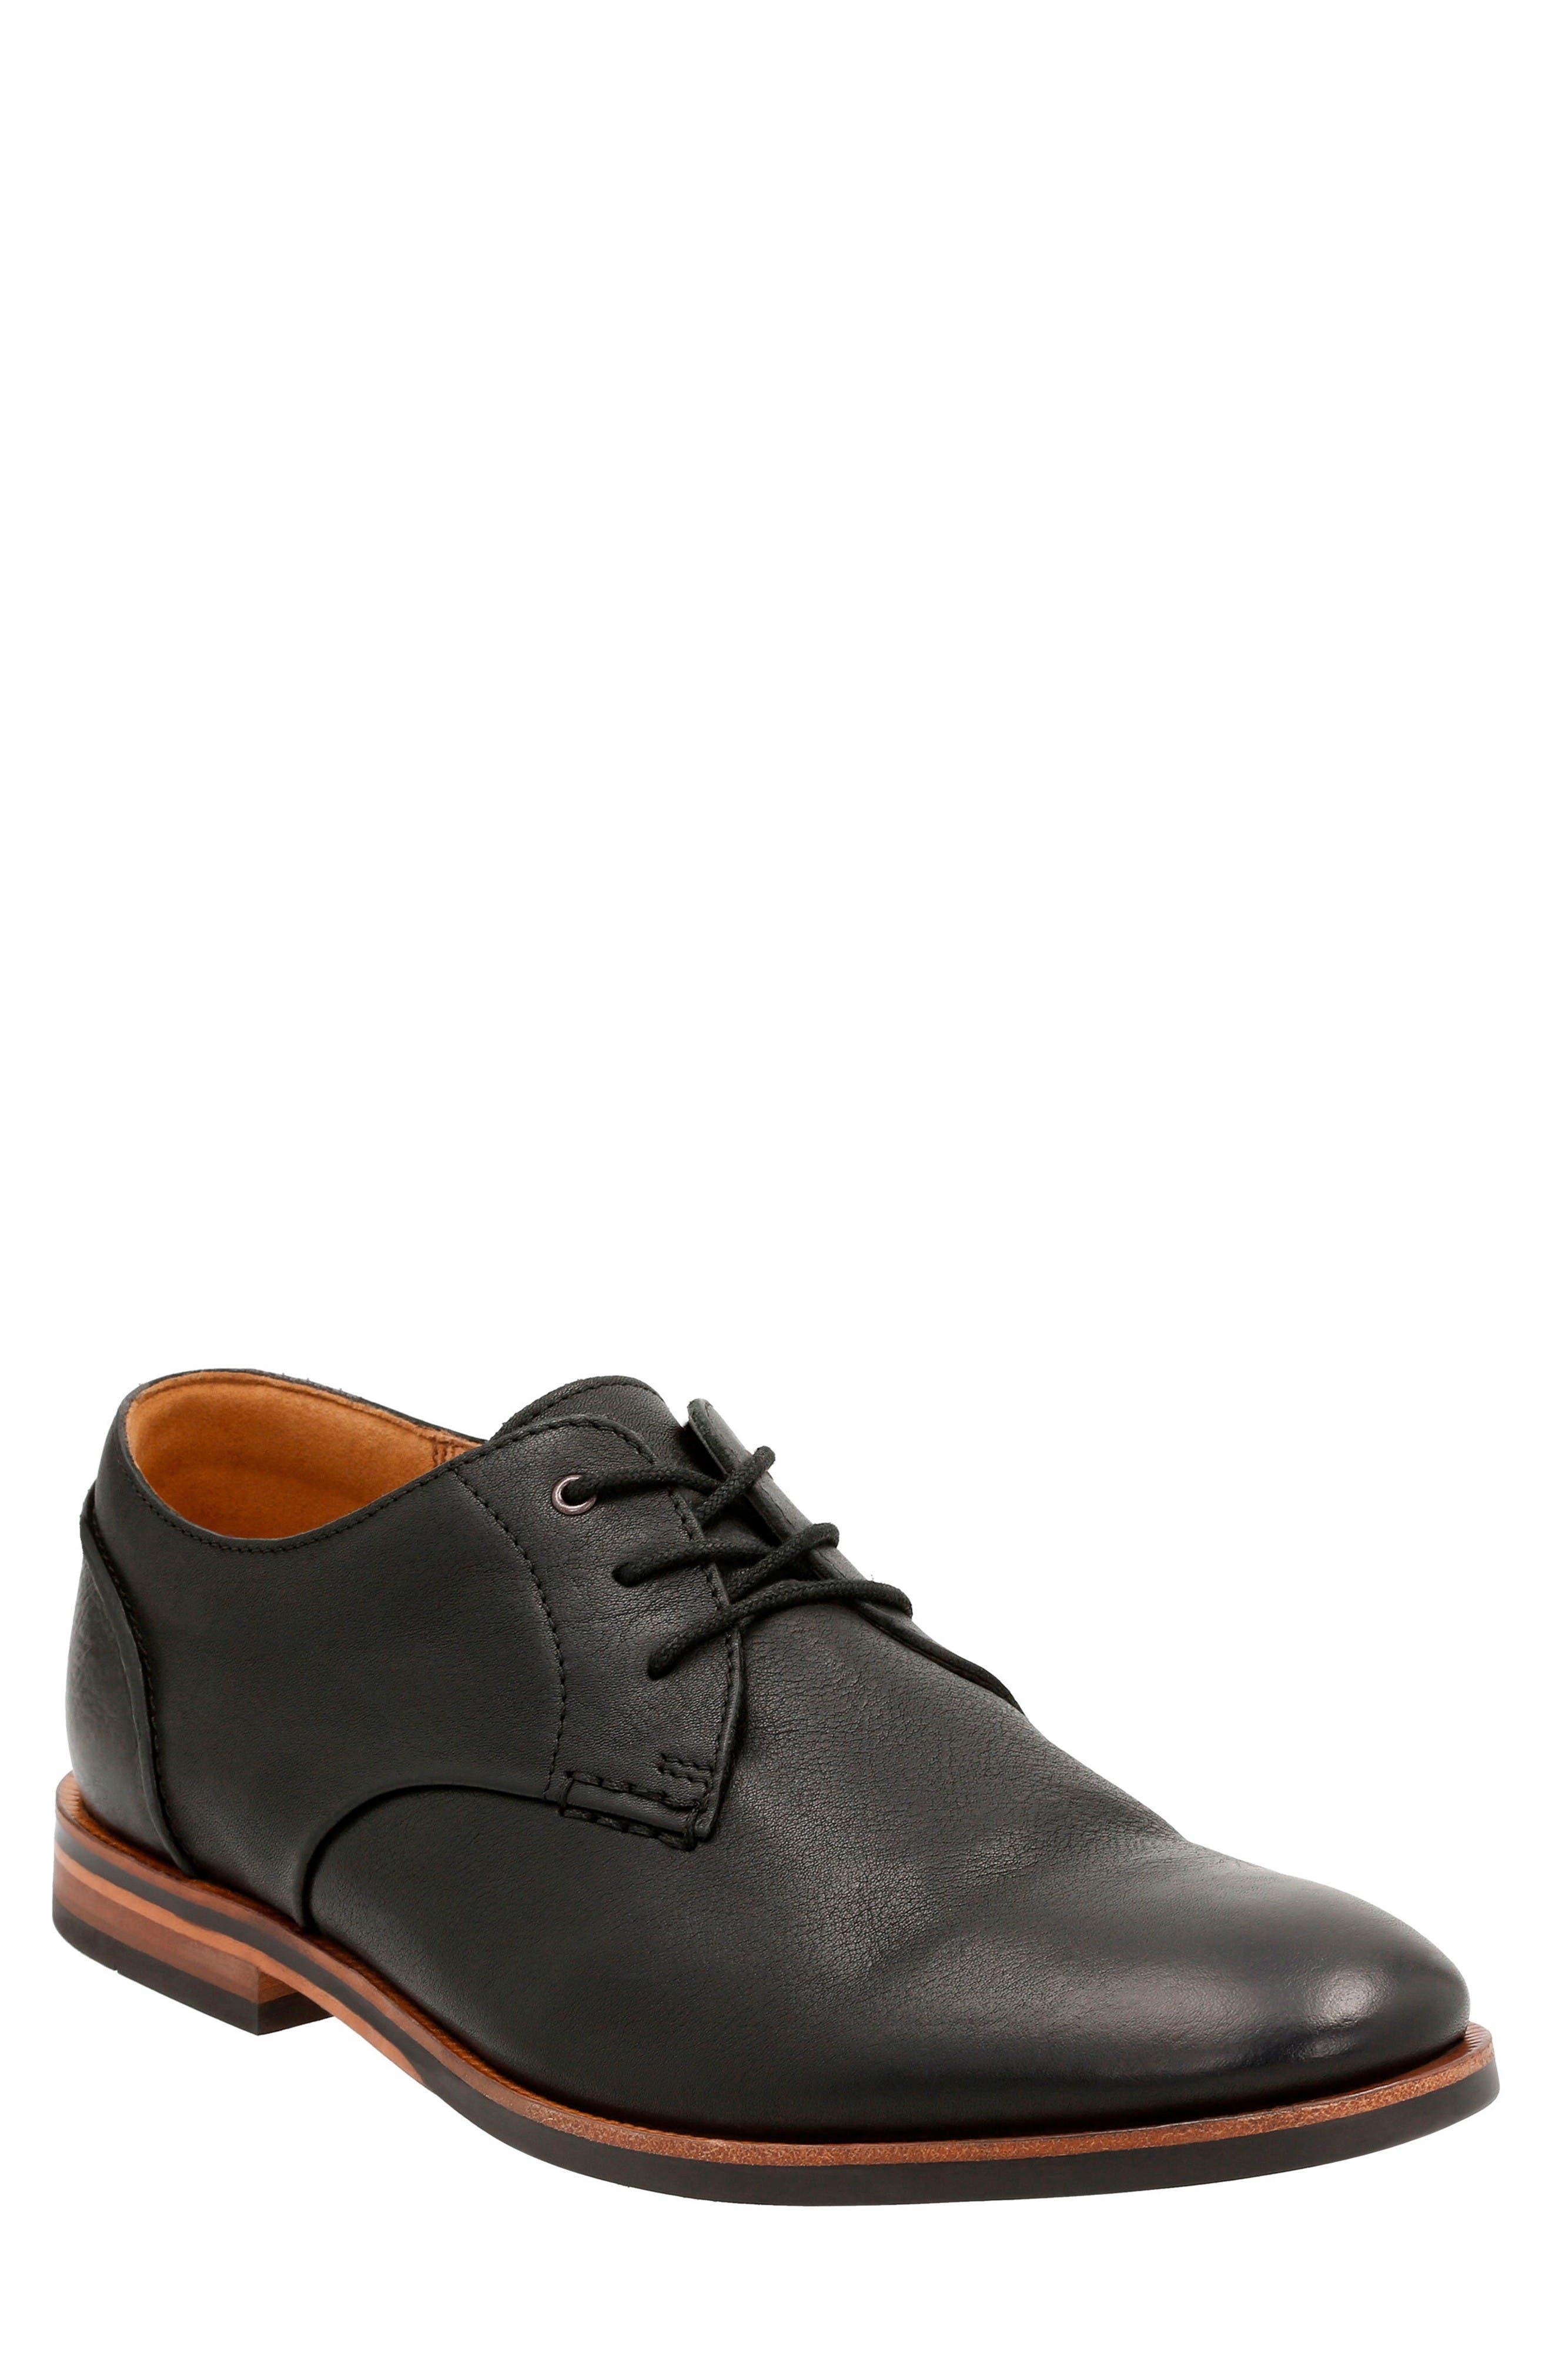 Clarks® Broyd Walk Plain Toe Derby (Men)